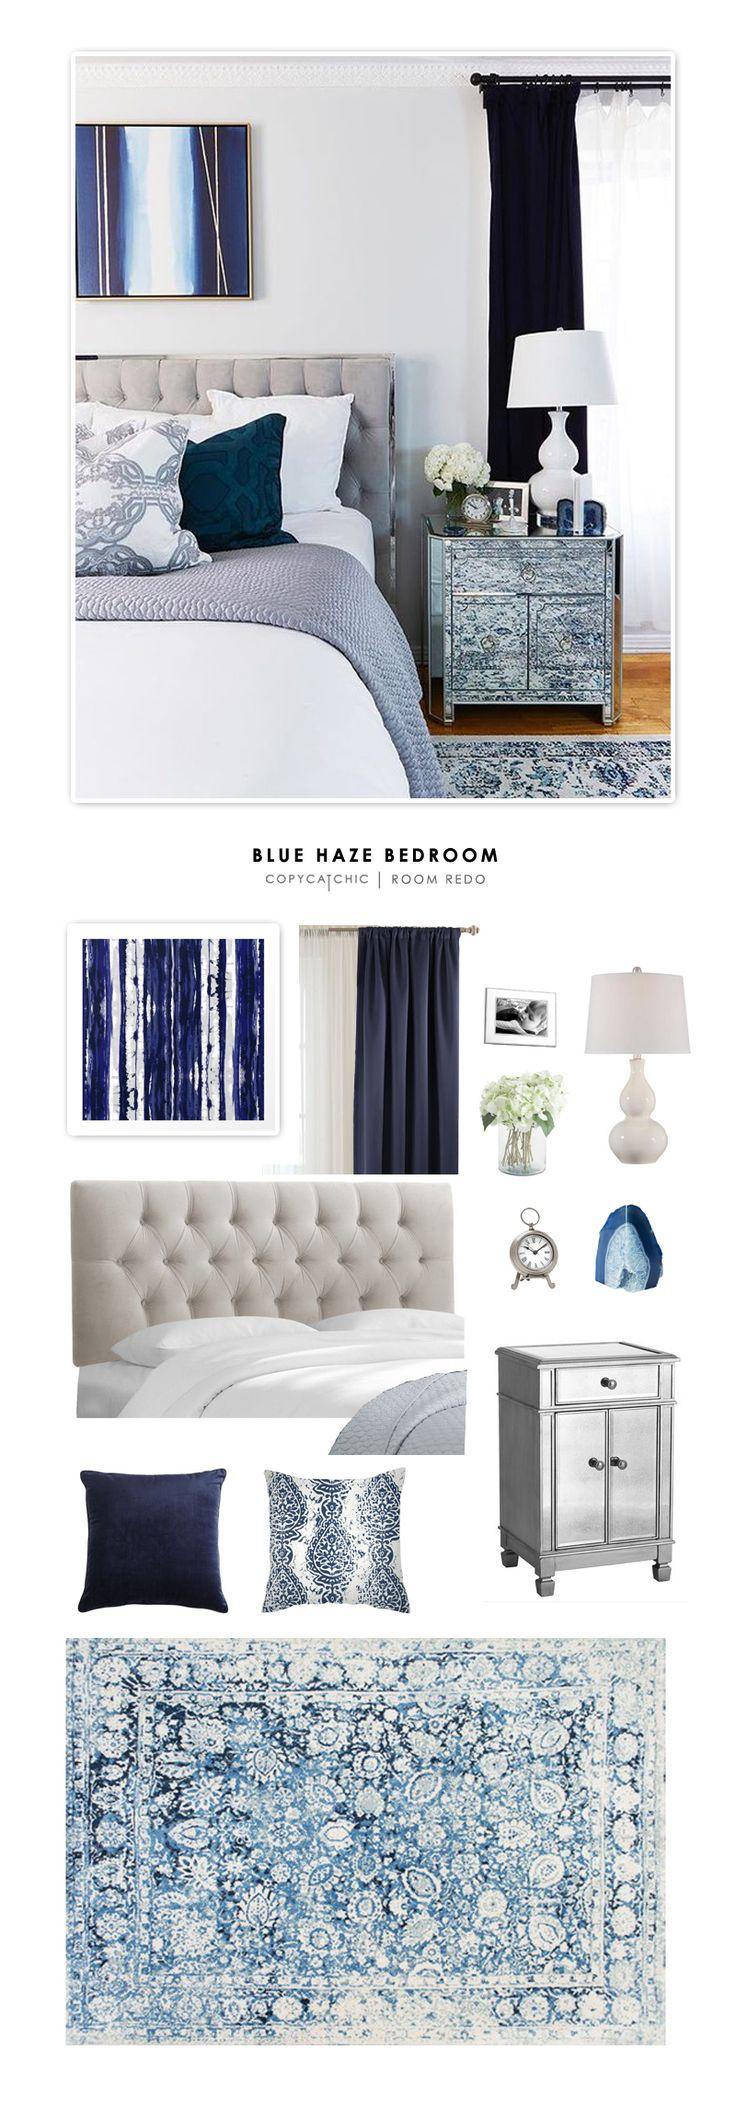 Copy Cat Chic Room Redo | Sophisticated Blue Bedroom | Copy Cat Chic | Bloglovin'